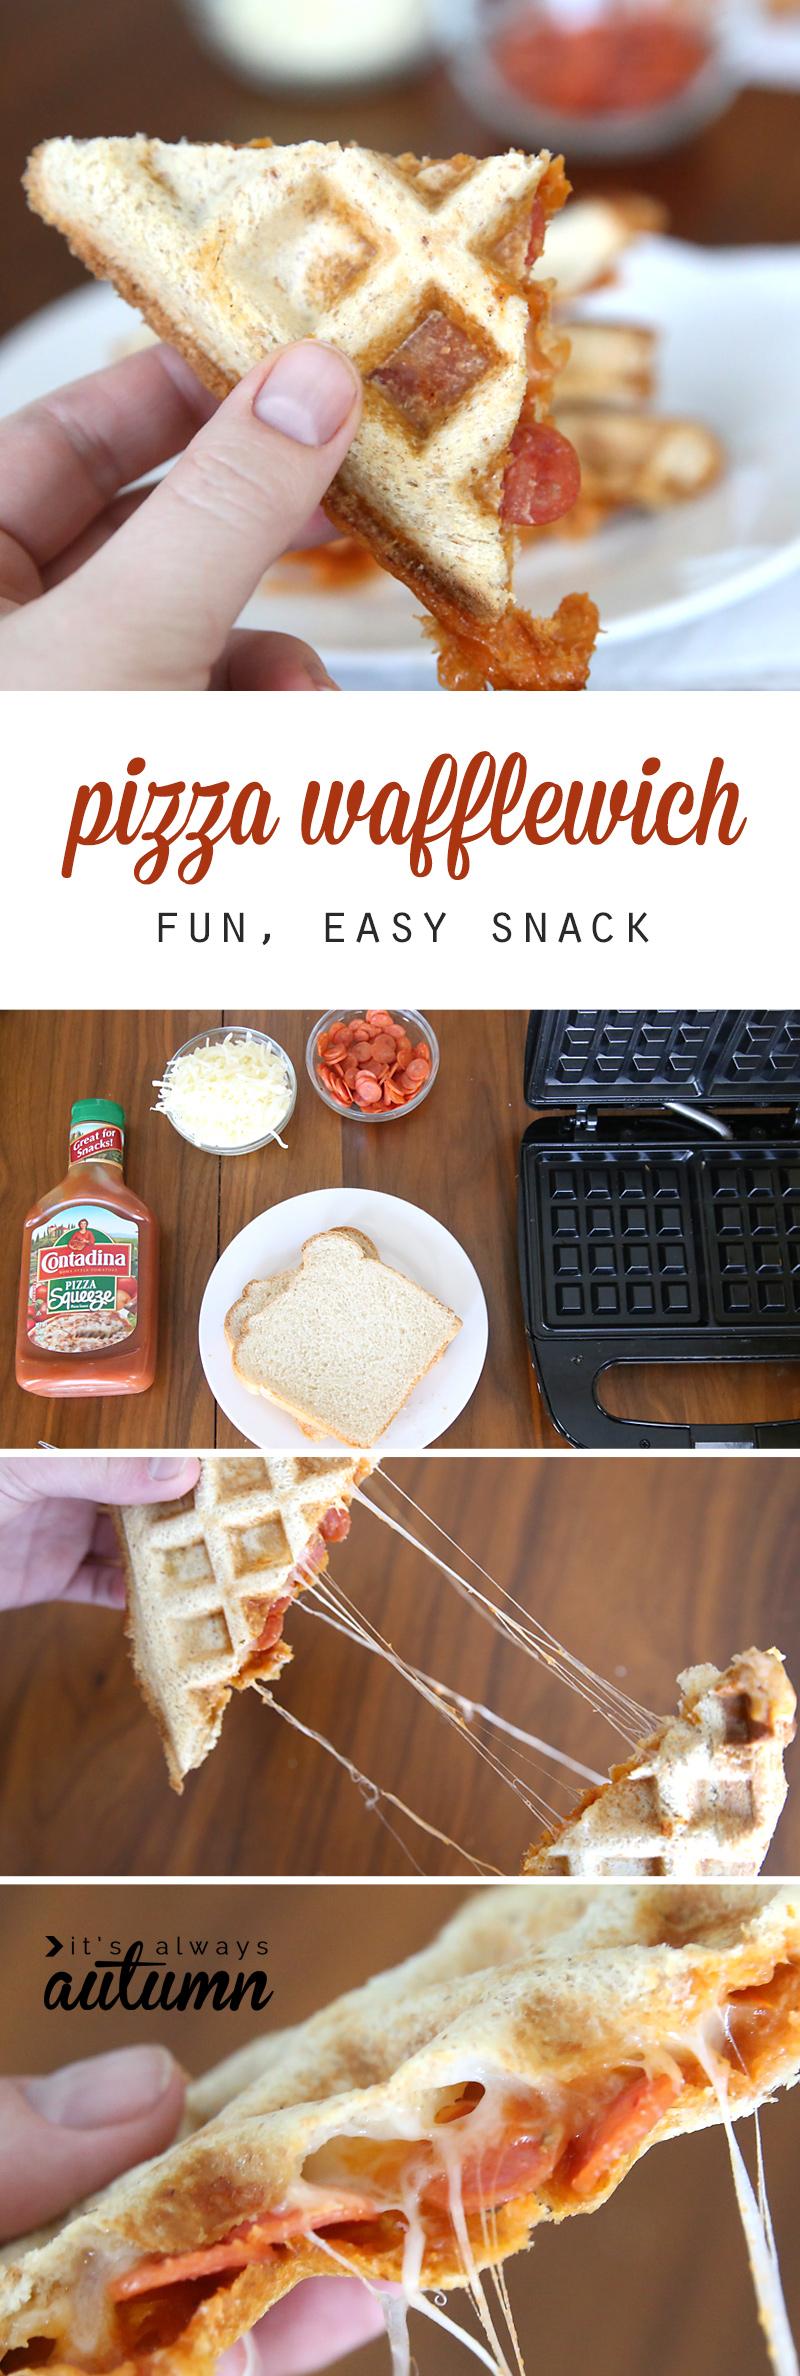 pizza wafflewich {easy recipe kids can make} - It's Always Autumn #Easy Recipes pizza pizza wafflewich {easy recipe kids can make} - It's Always Autumn